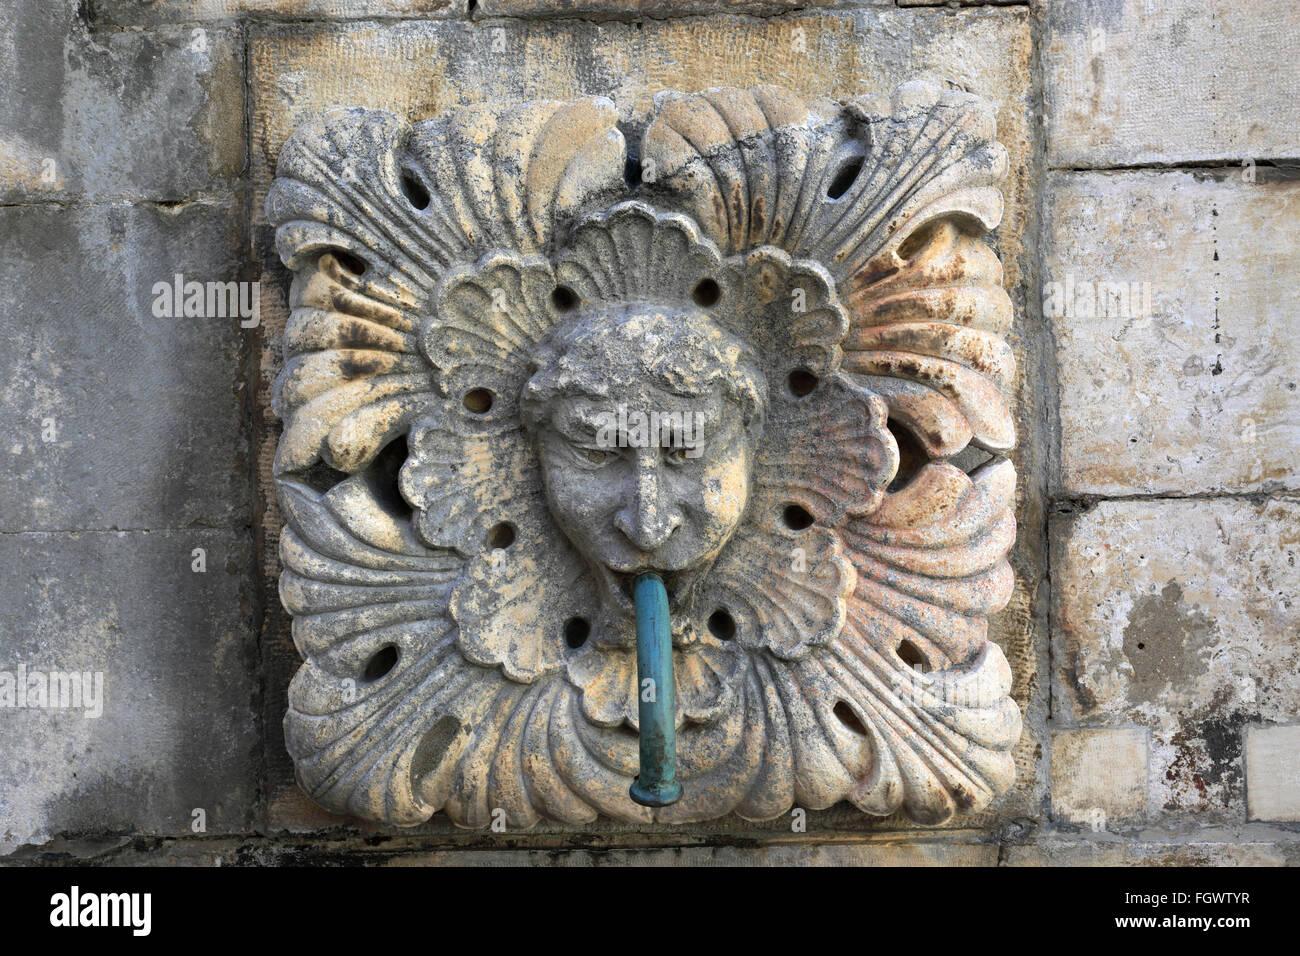 La grande fontaine, rue Main Onofrios, Dubrovnik, Dubrovnik-Neretva County, côte dalmate, Mer Adriatique, la Croatie, Balkans Banque D'Images